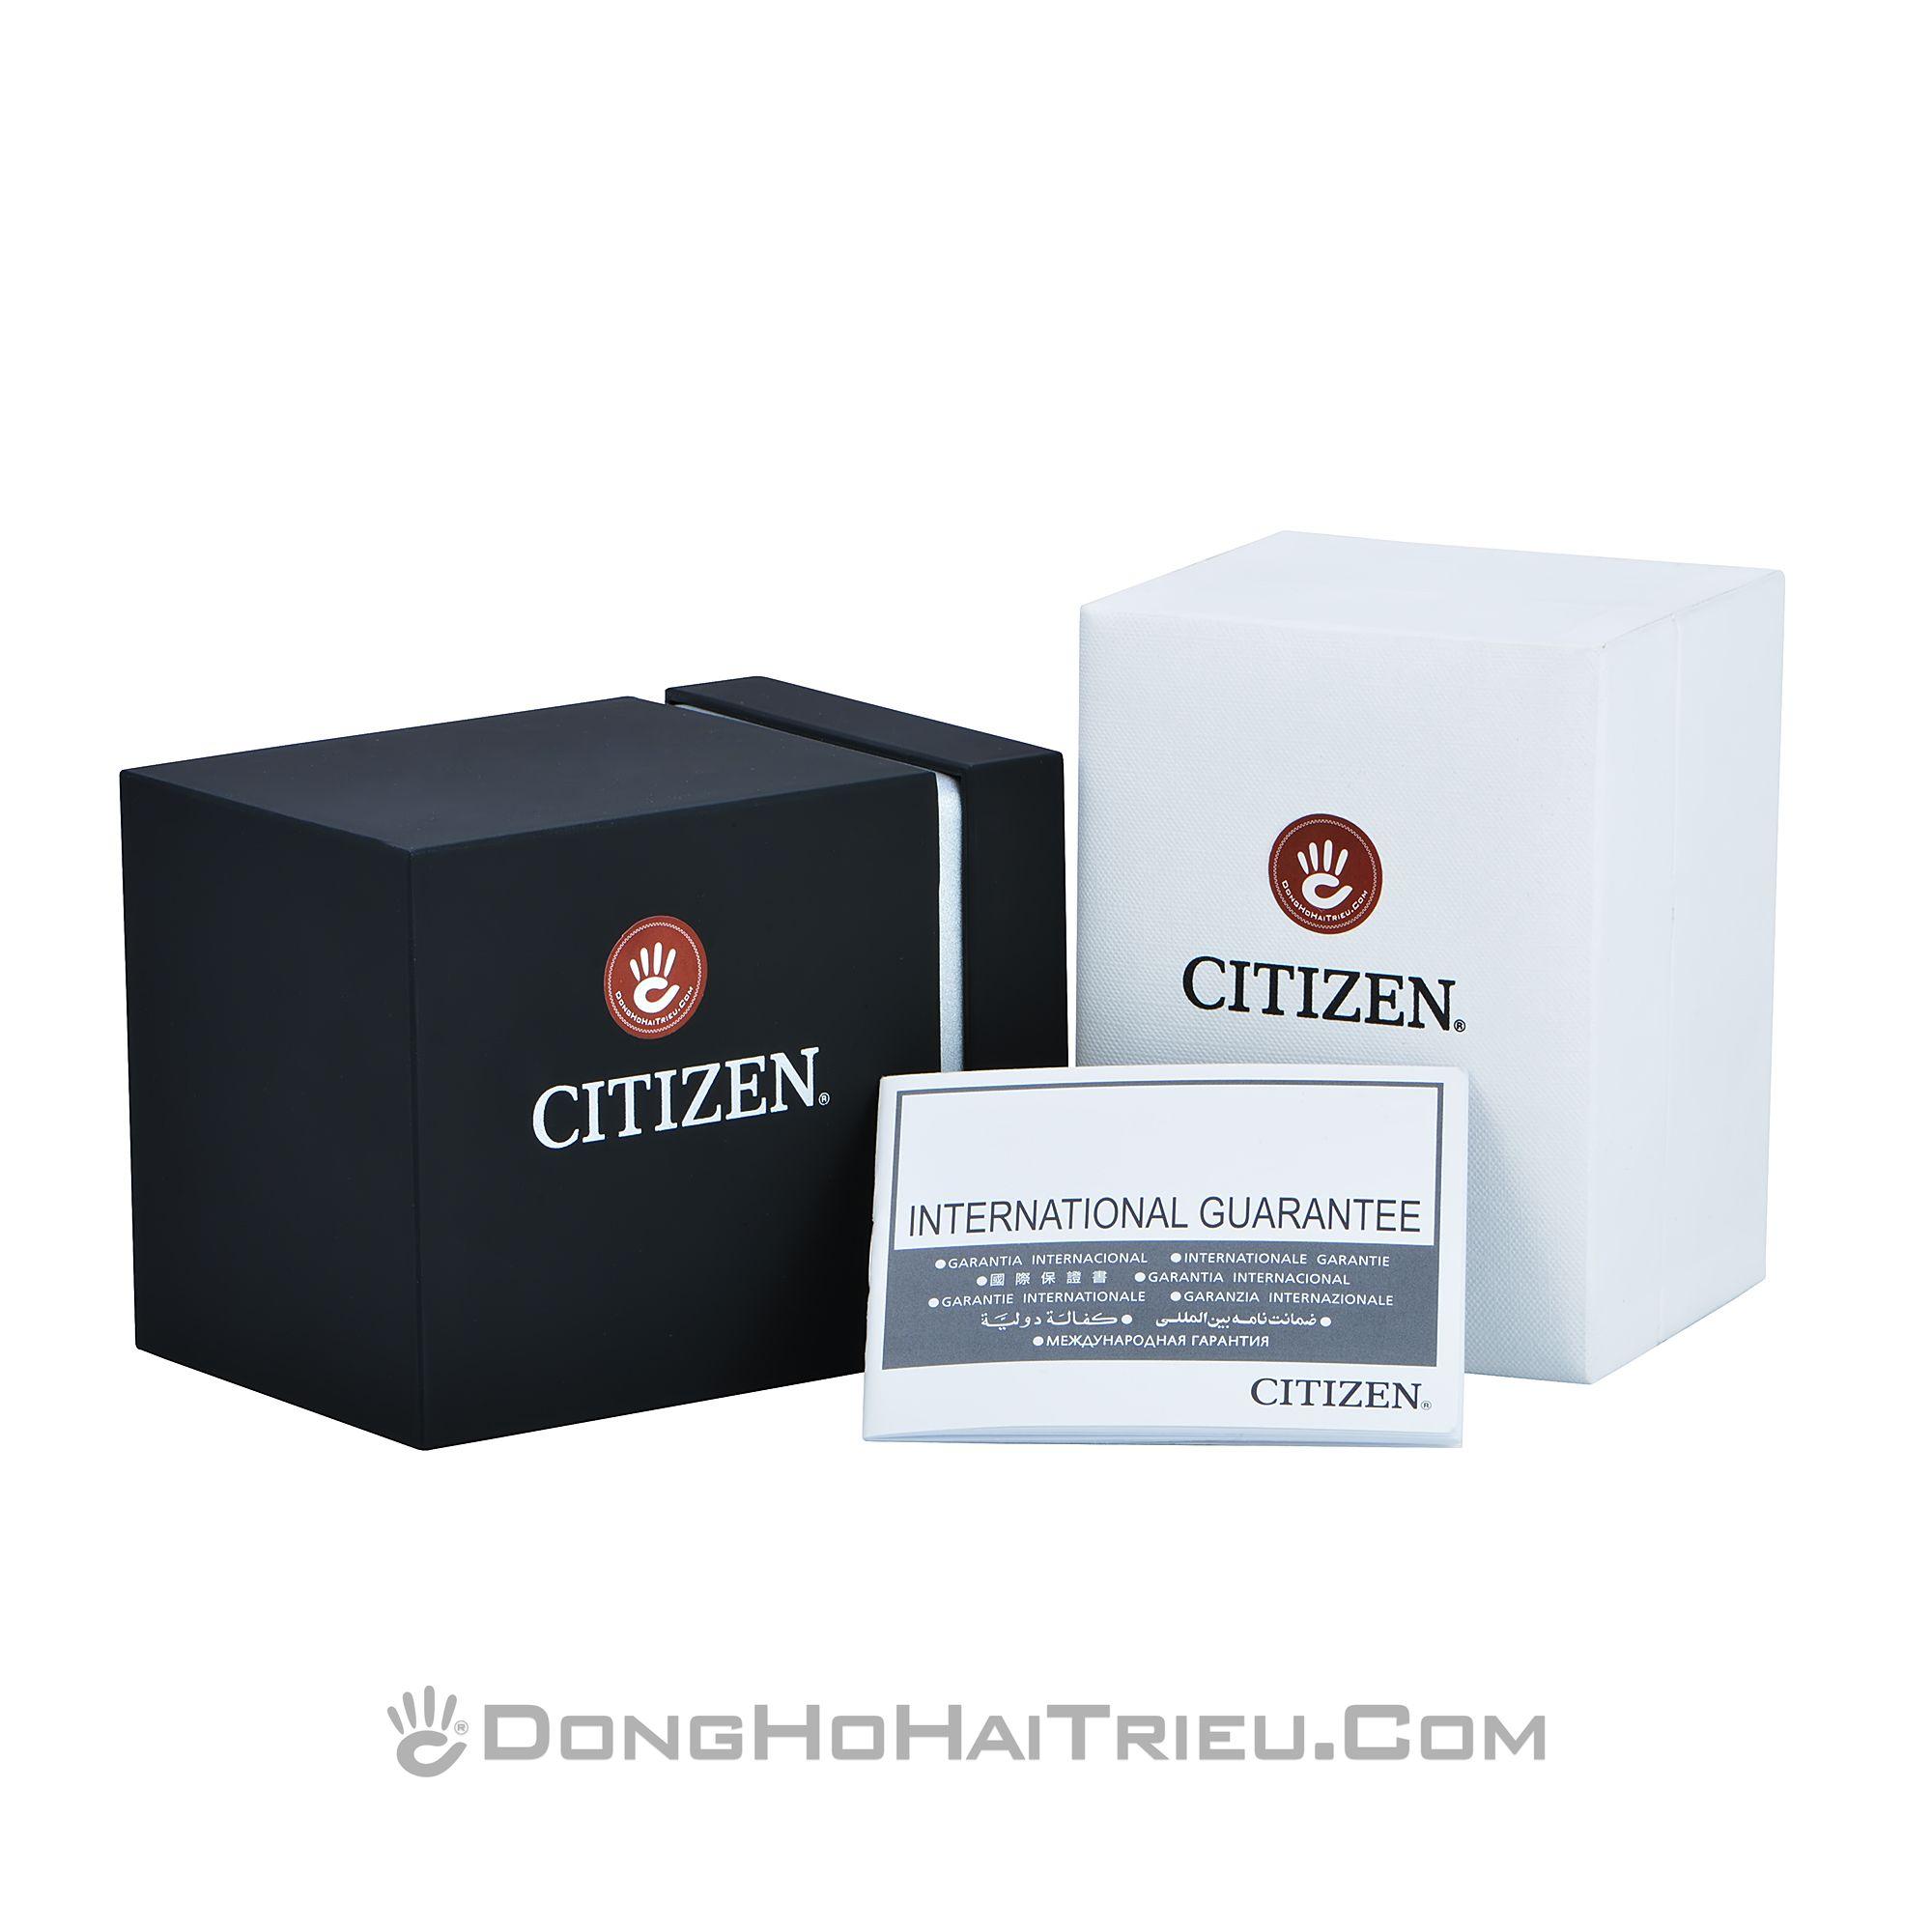 Citizen-Box1 (1)